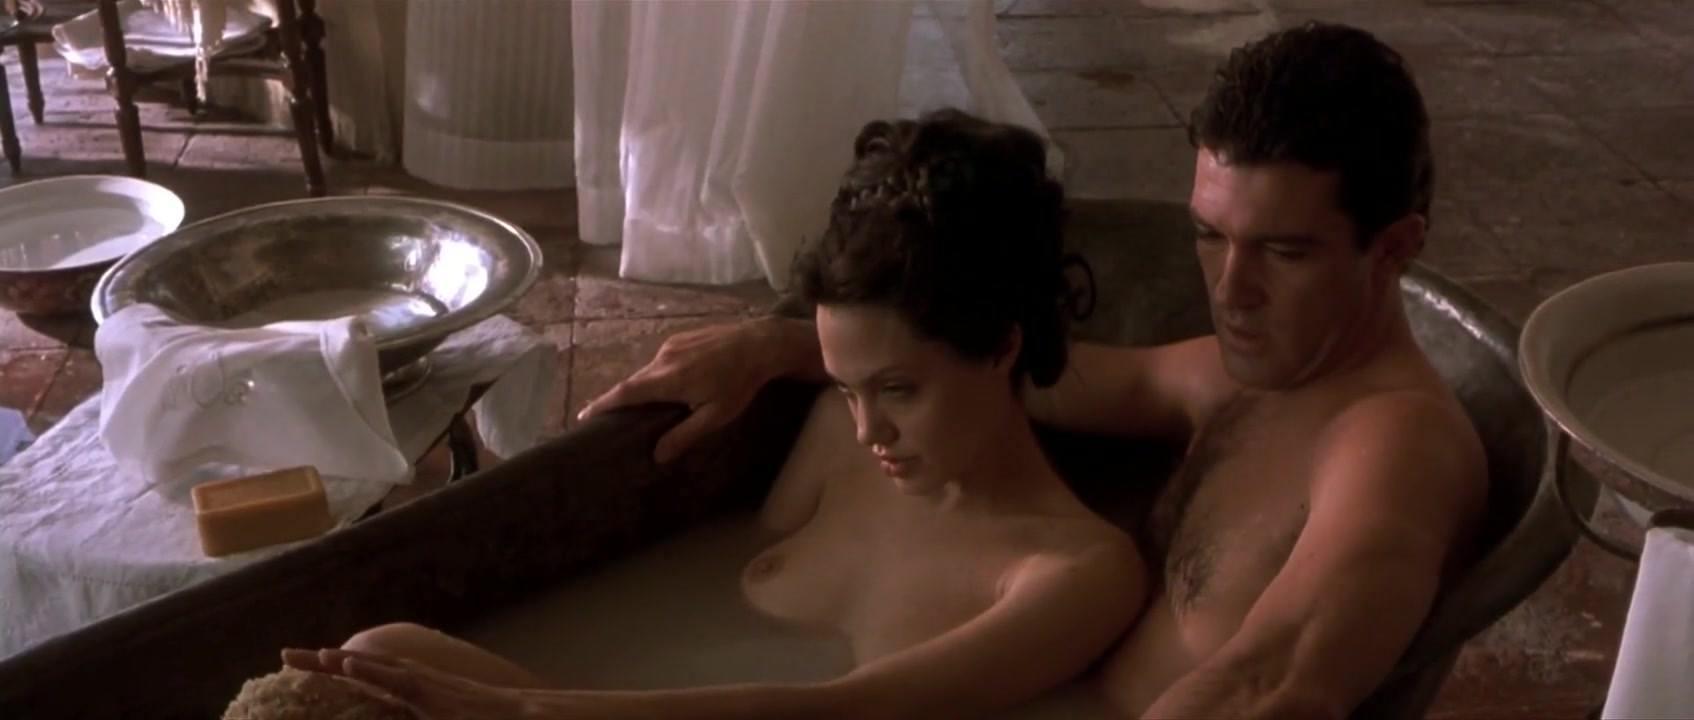 Angelina Jolie Porno Video angelina jolie - original sin (2001)